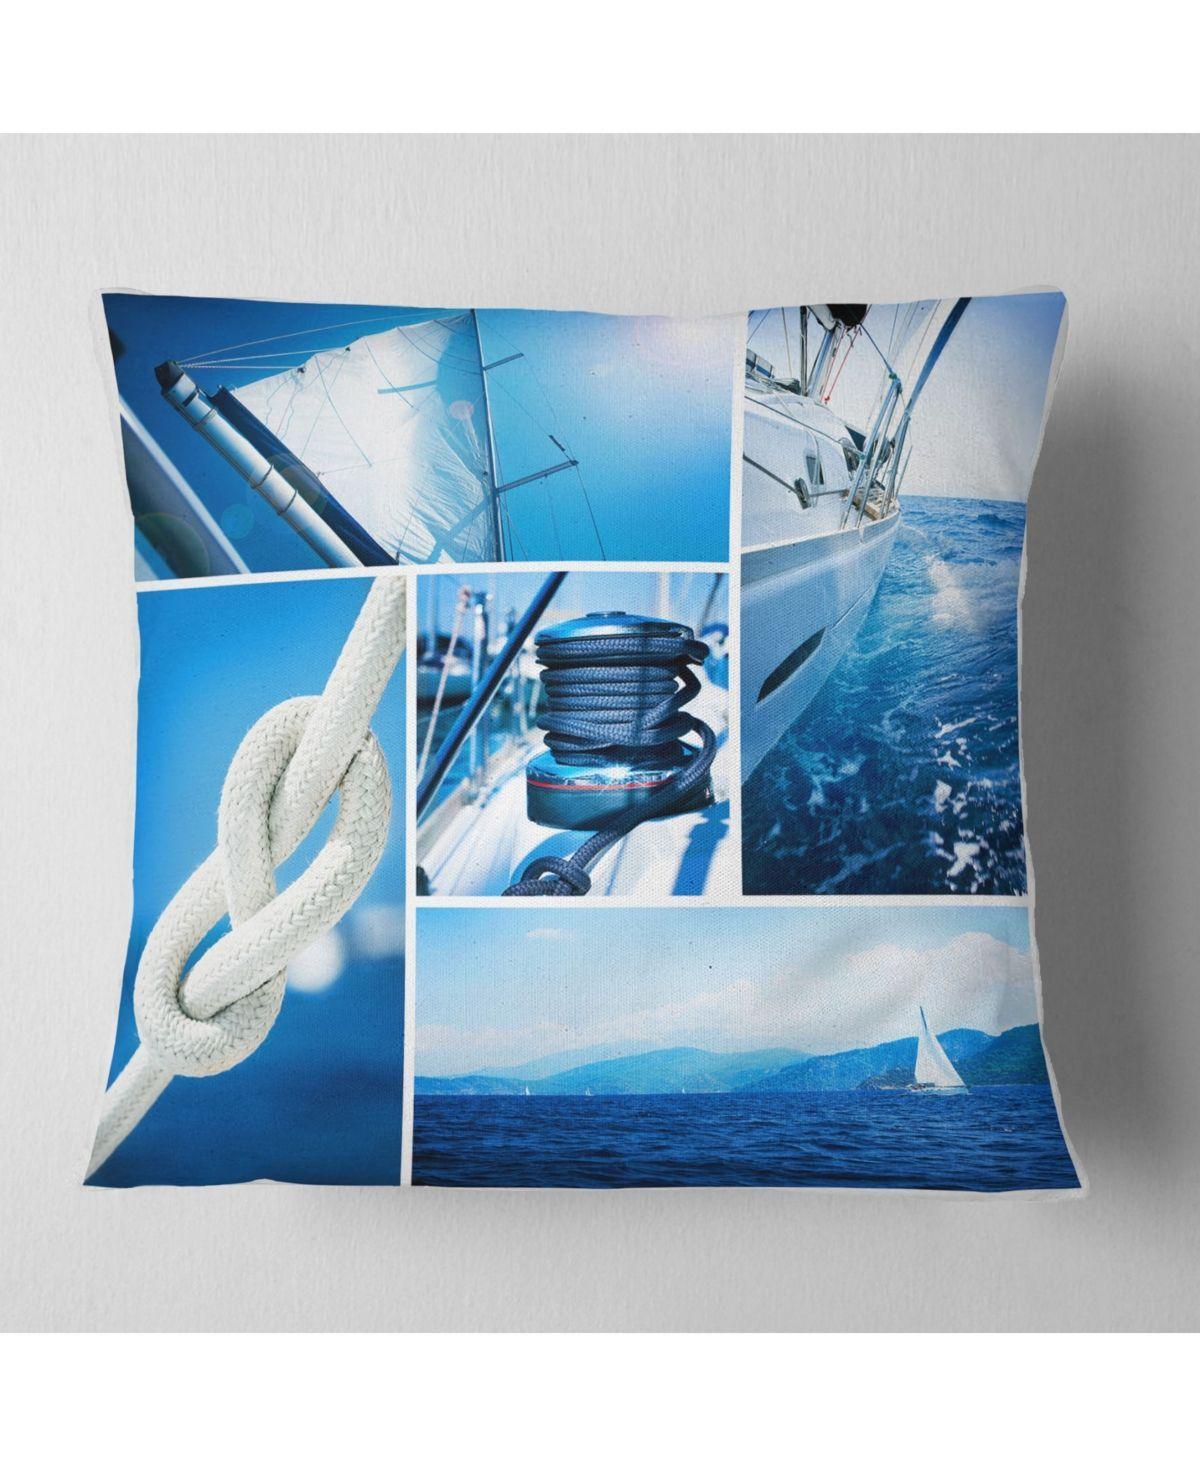 Designart Sailing Yacht In Blue Sea Collage Seashore Throw Pillow 26 X 26 Blue Yachtwoman Sailing Yacht Throw Pillows Beautiful Throw Pillows